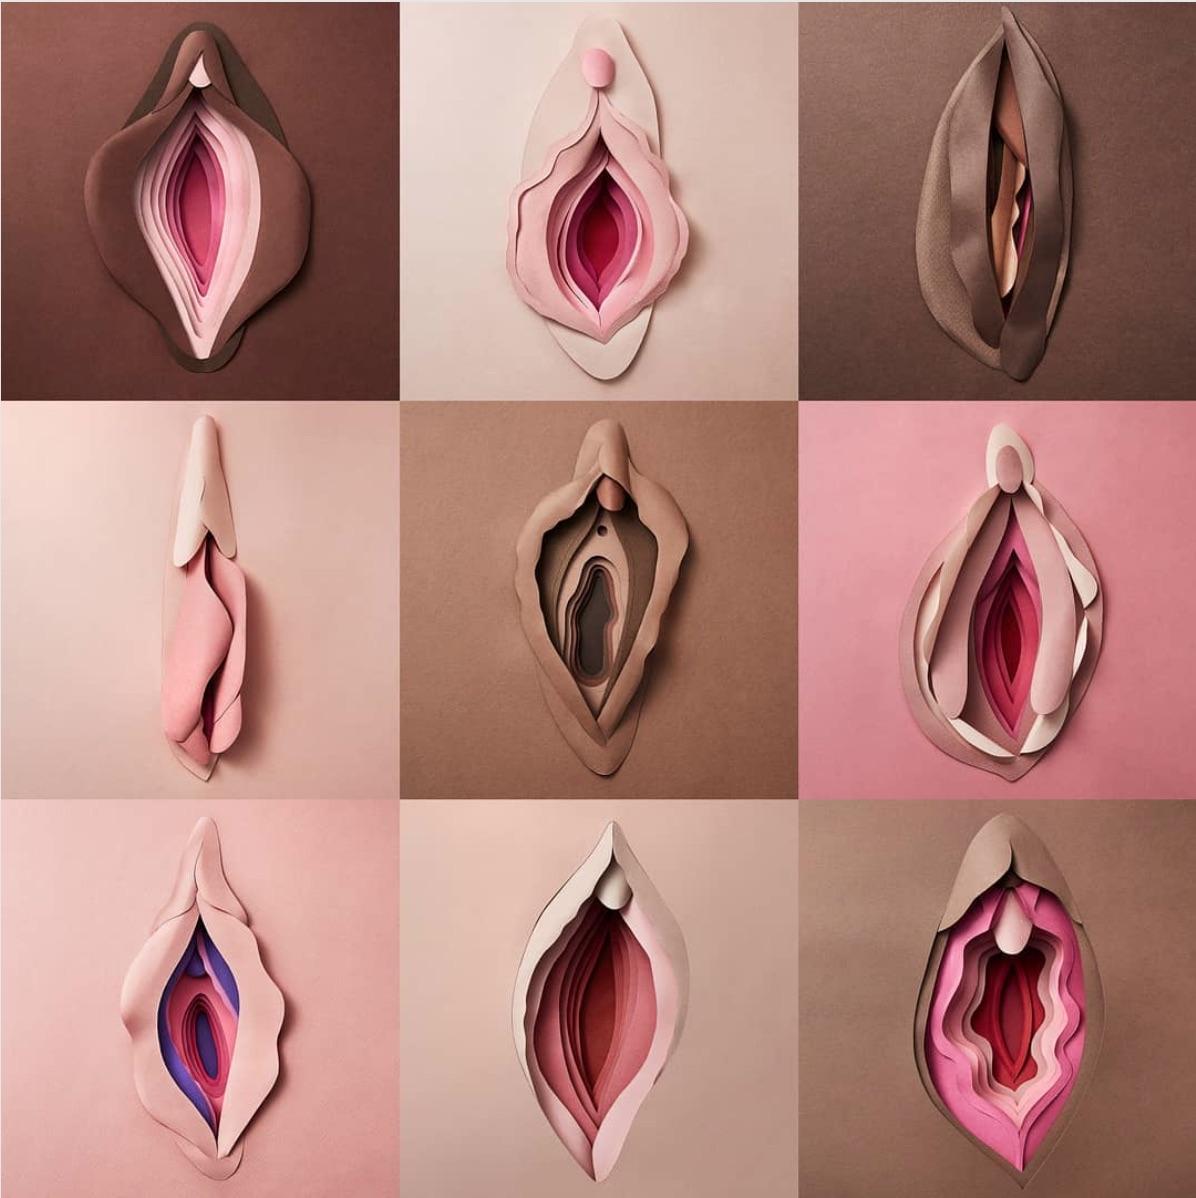 vulva-cultbeauty